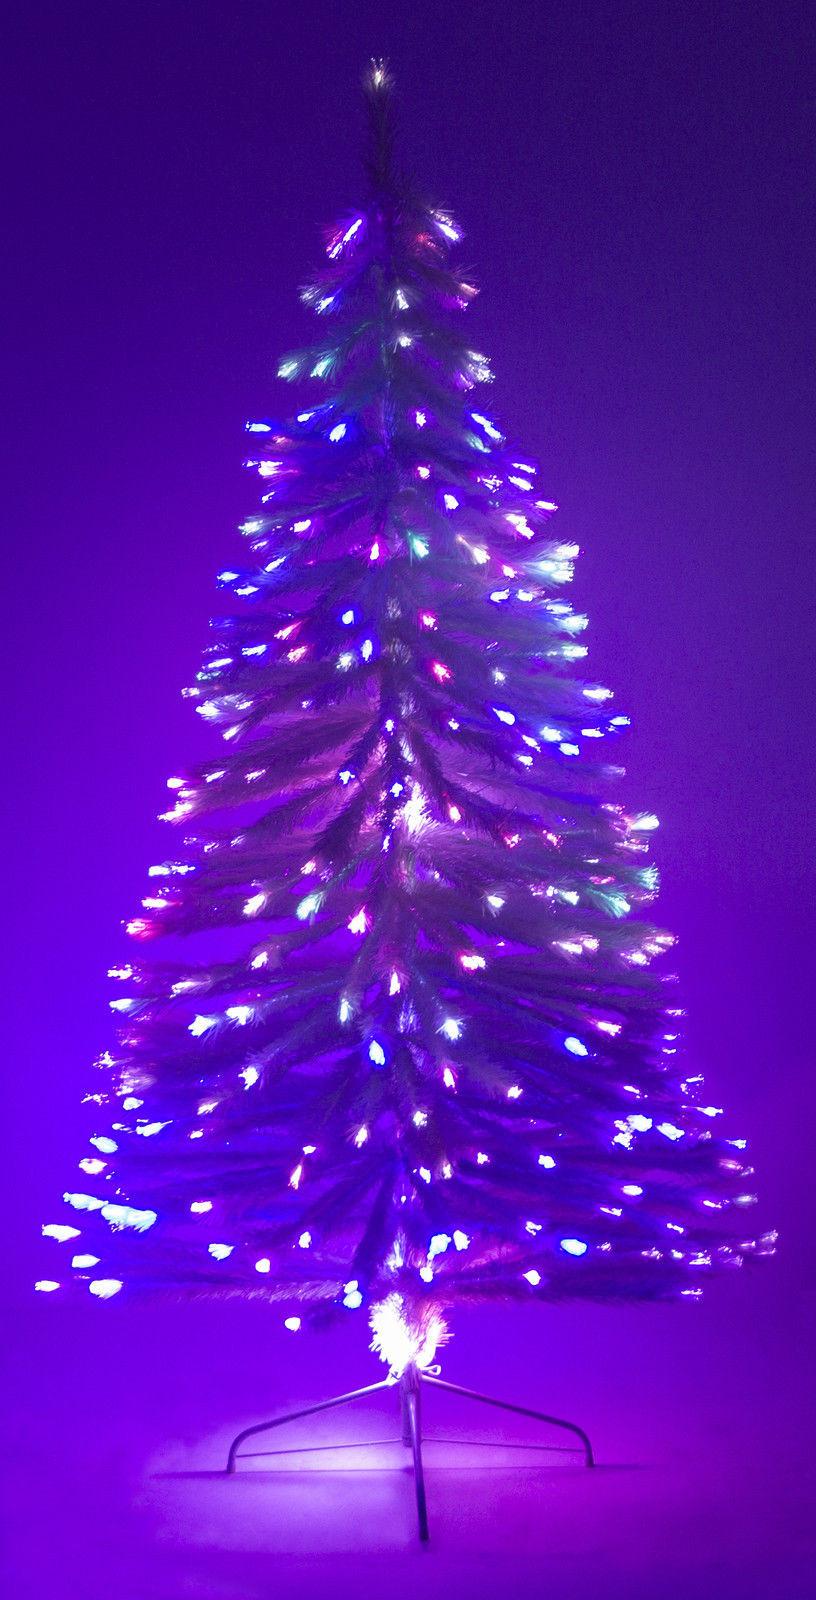 Fiber Optic Christmas Lighting  6 Ft White Artificial Holiday Christmas Tree w Fiber